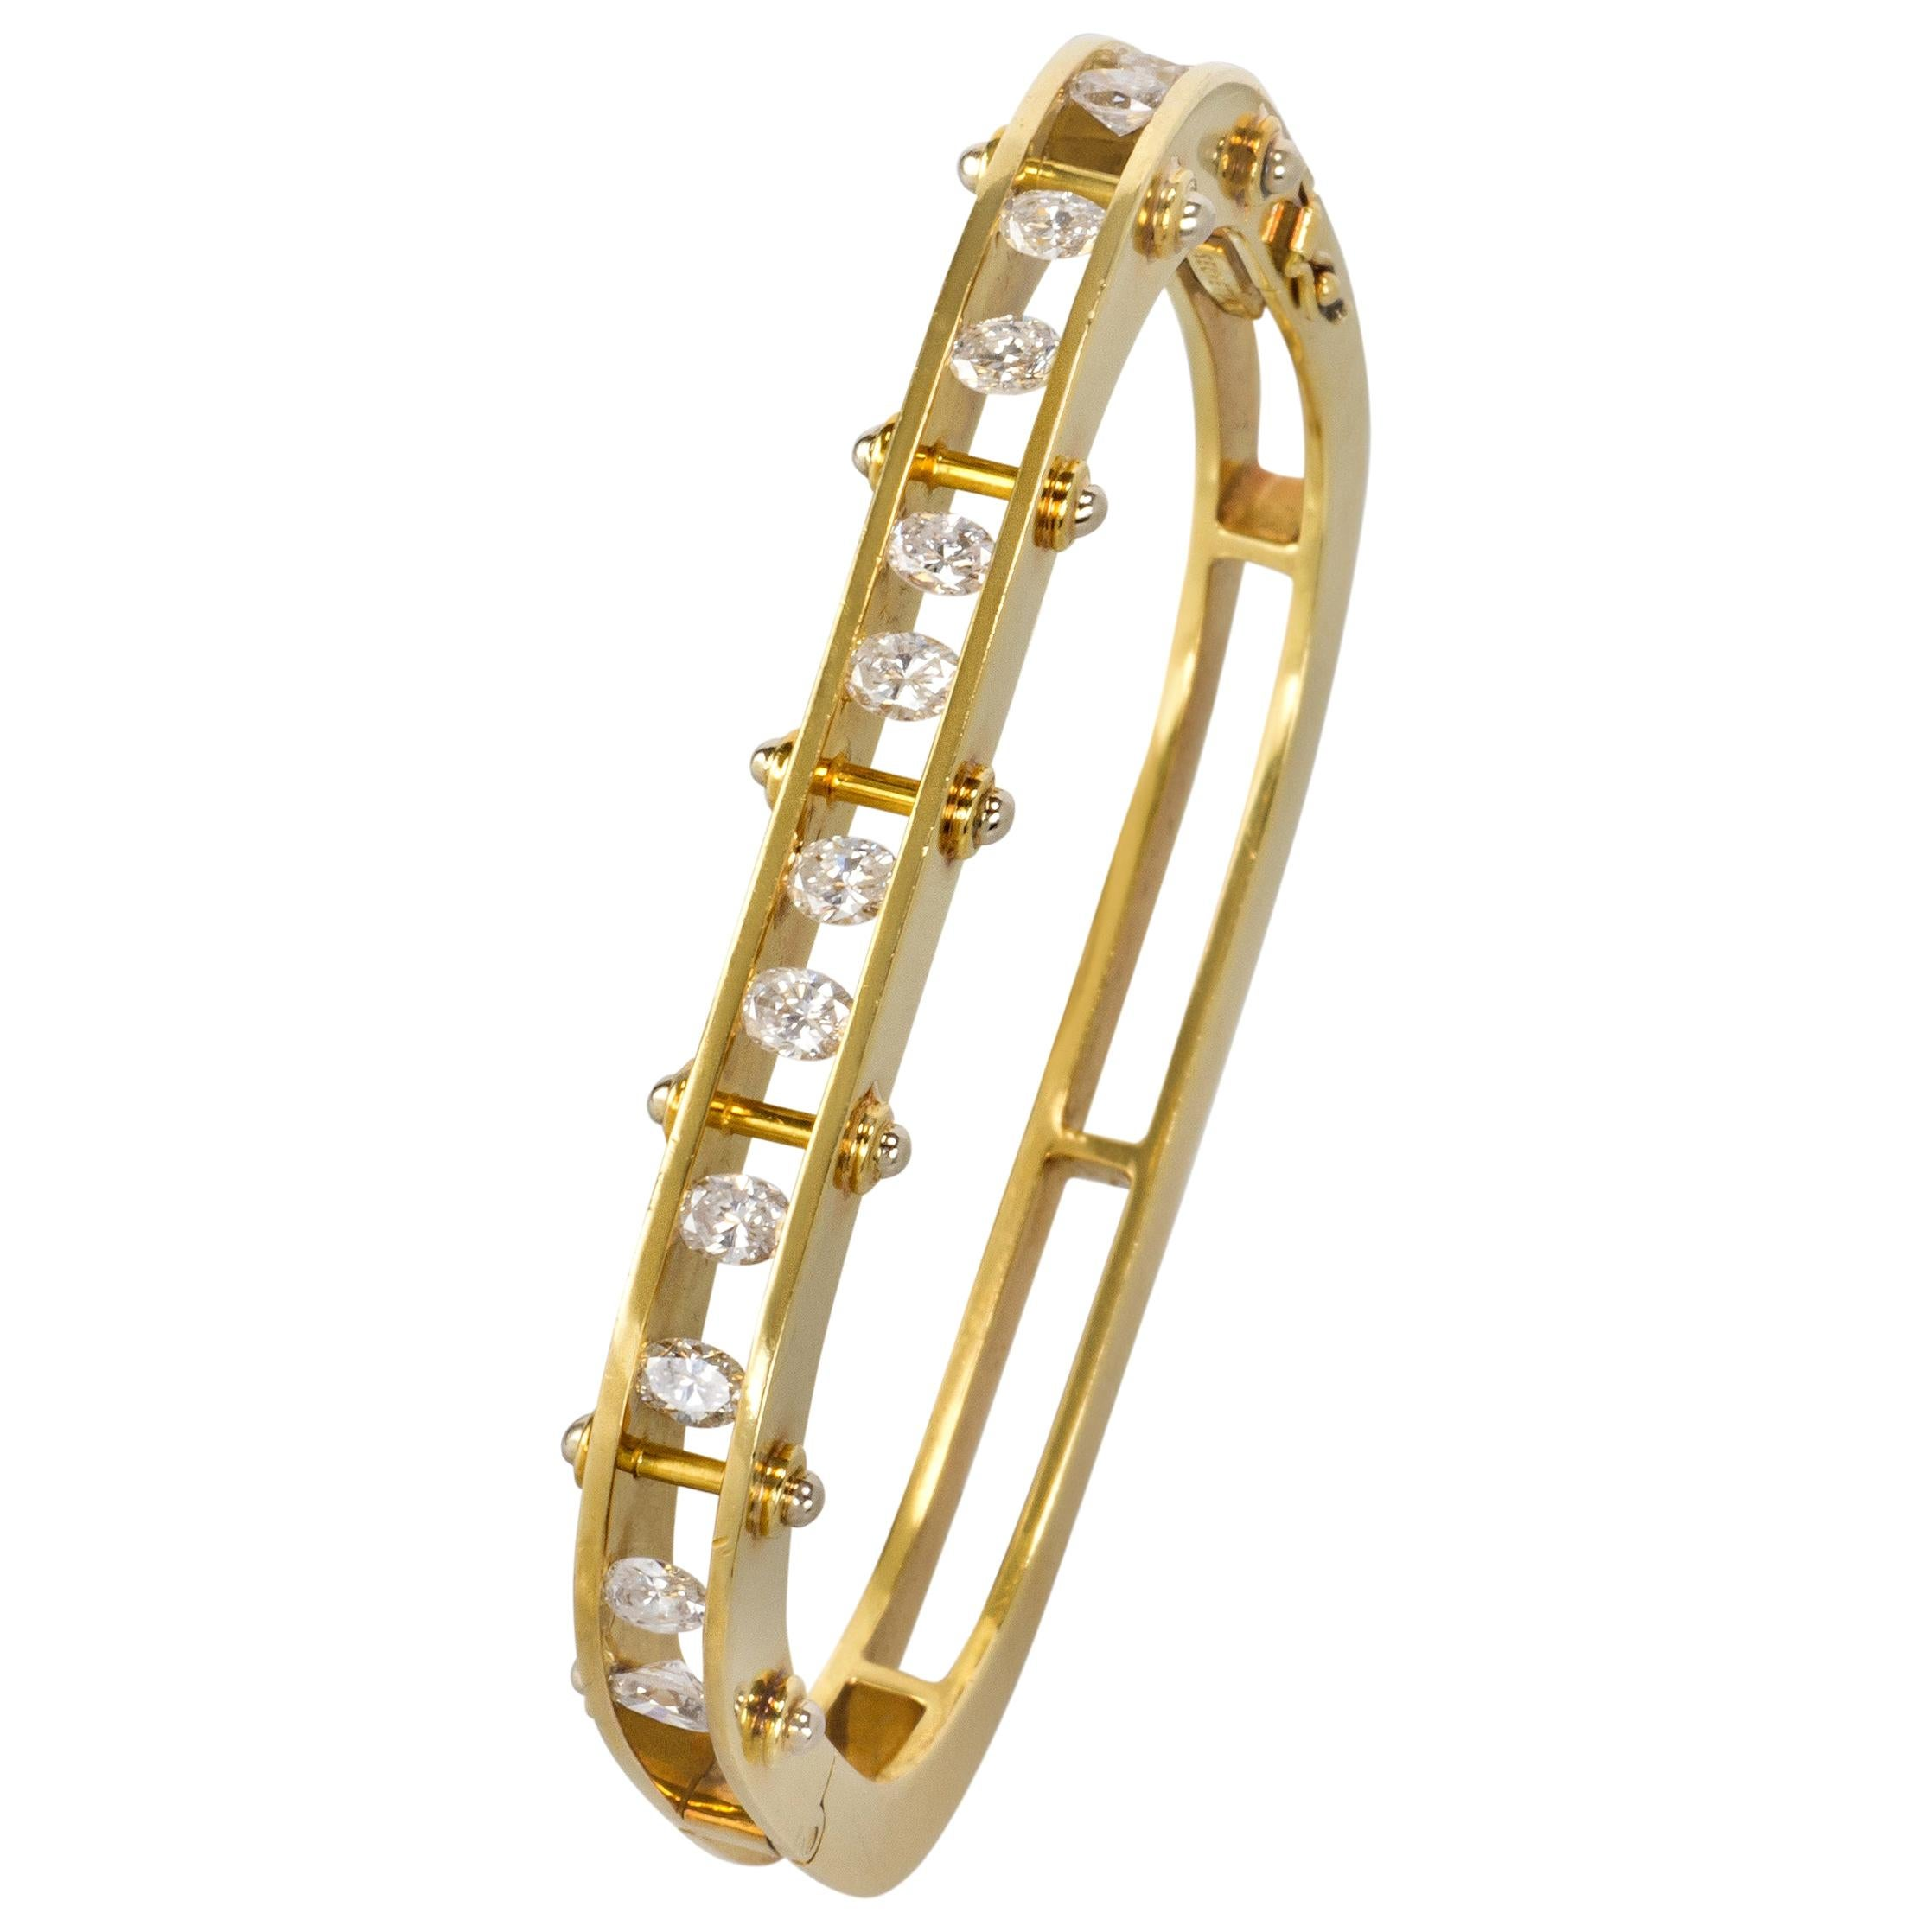 Secrett Diamond and Gold Bangle